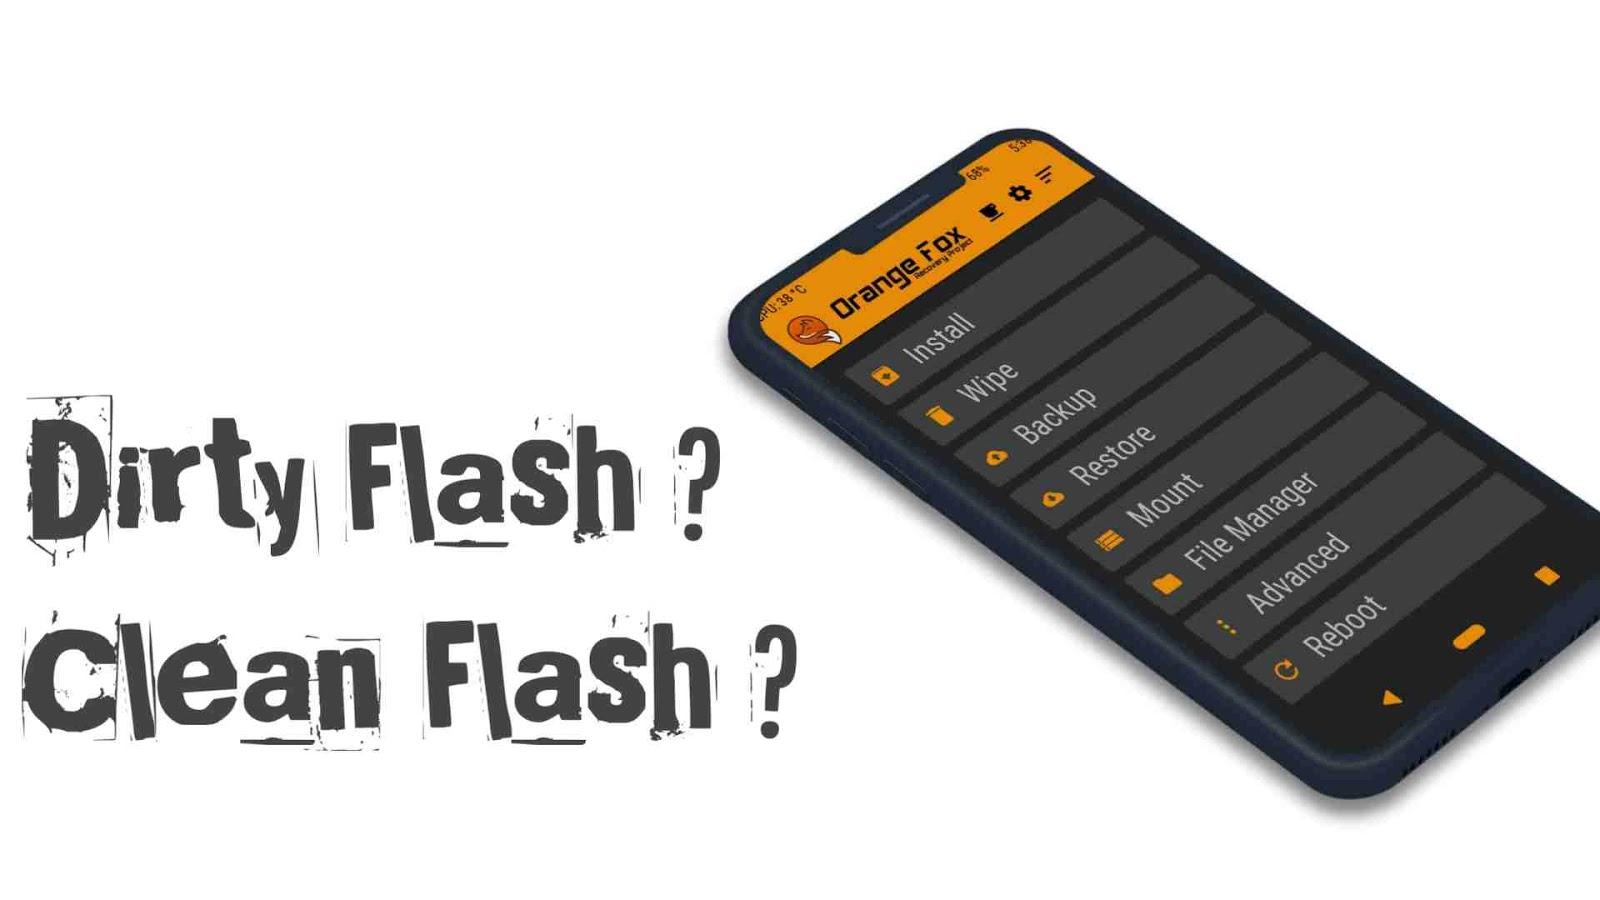 Pengertian dirty flash